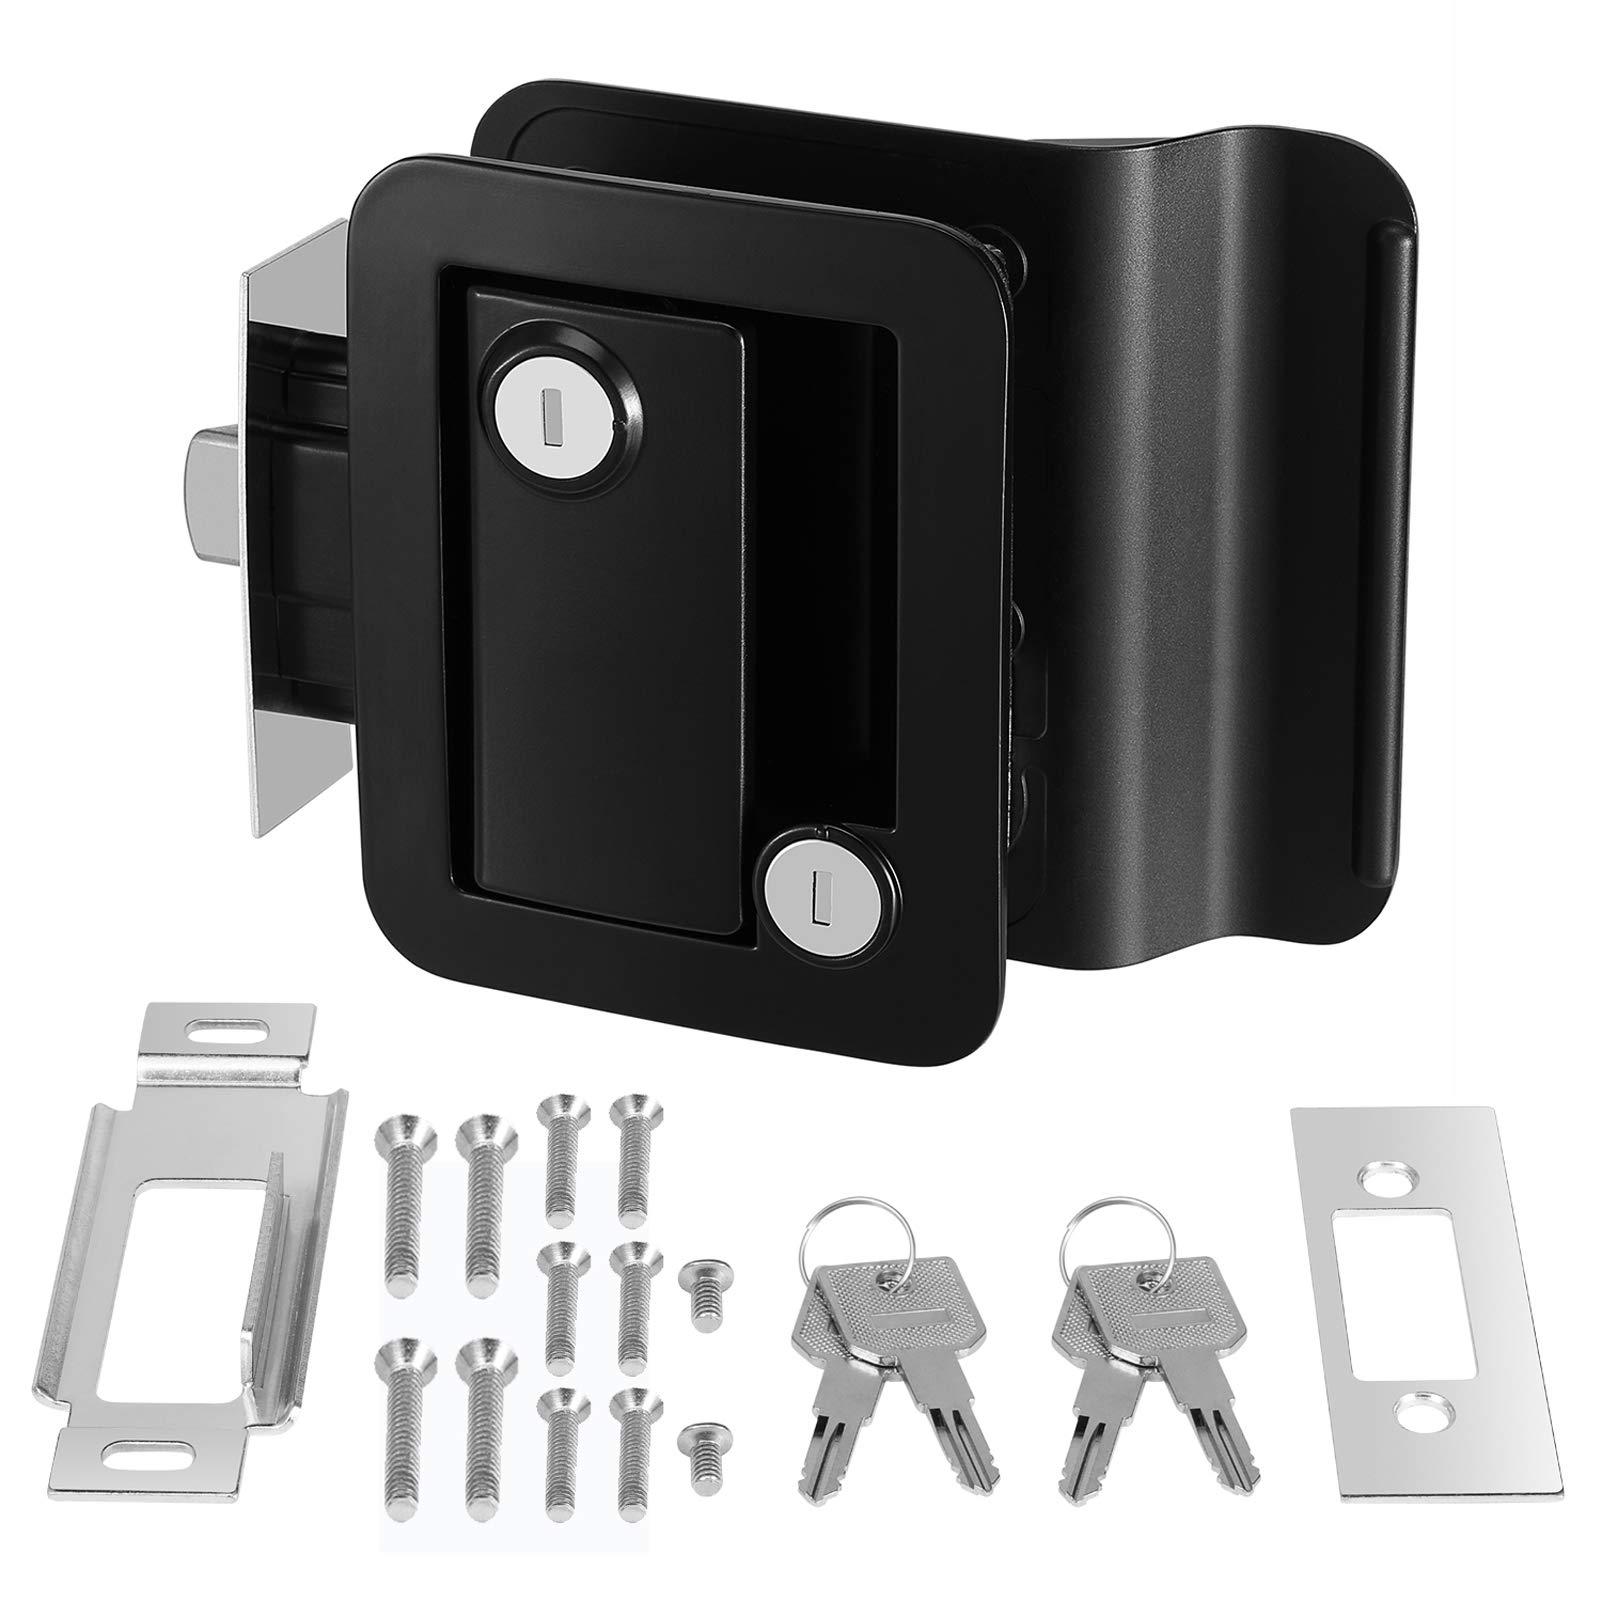 Kohree RV Travel Trailer Entry Door Lock with Paddle Deadbolt, Polar Black Camper Door Latch Handle with Keys RV Door…